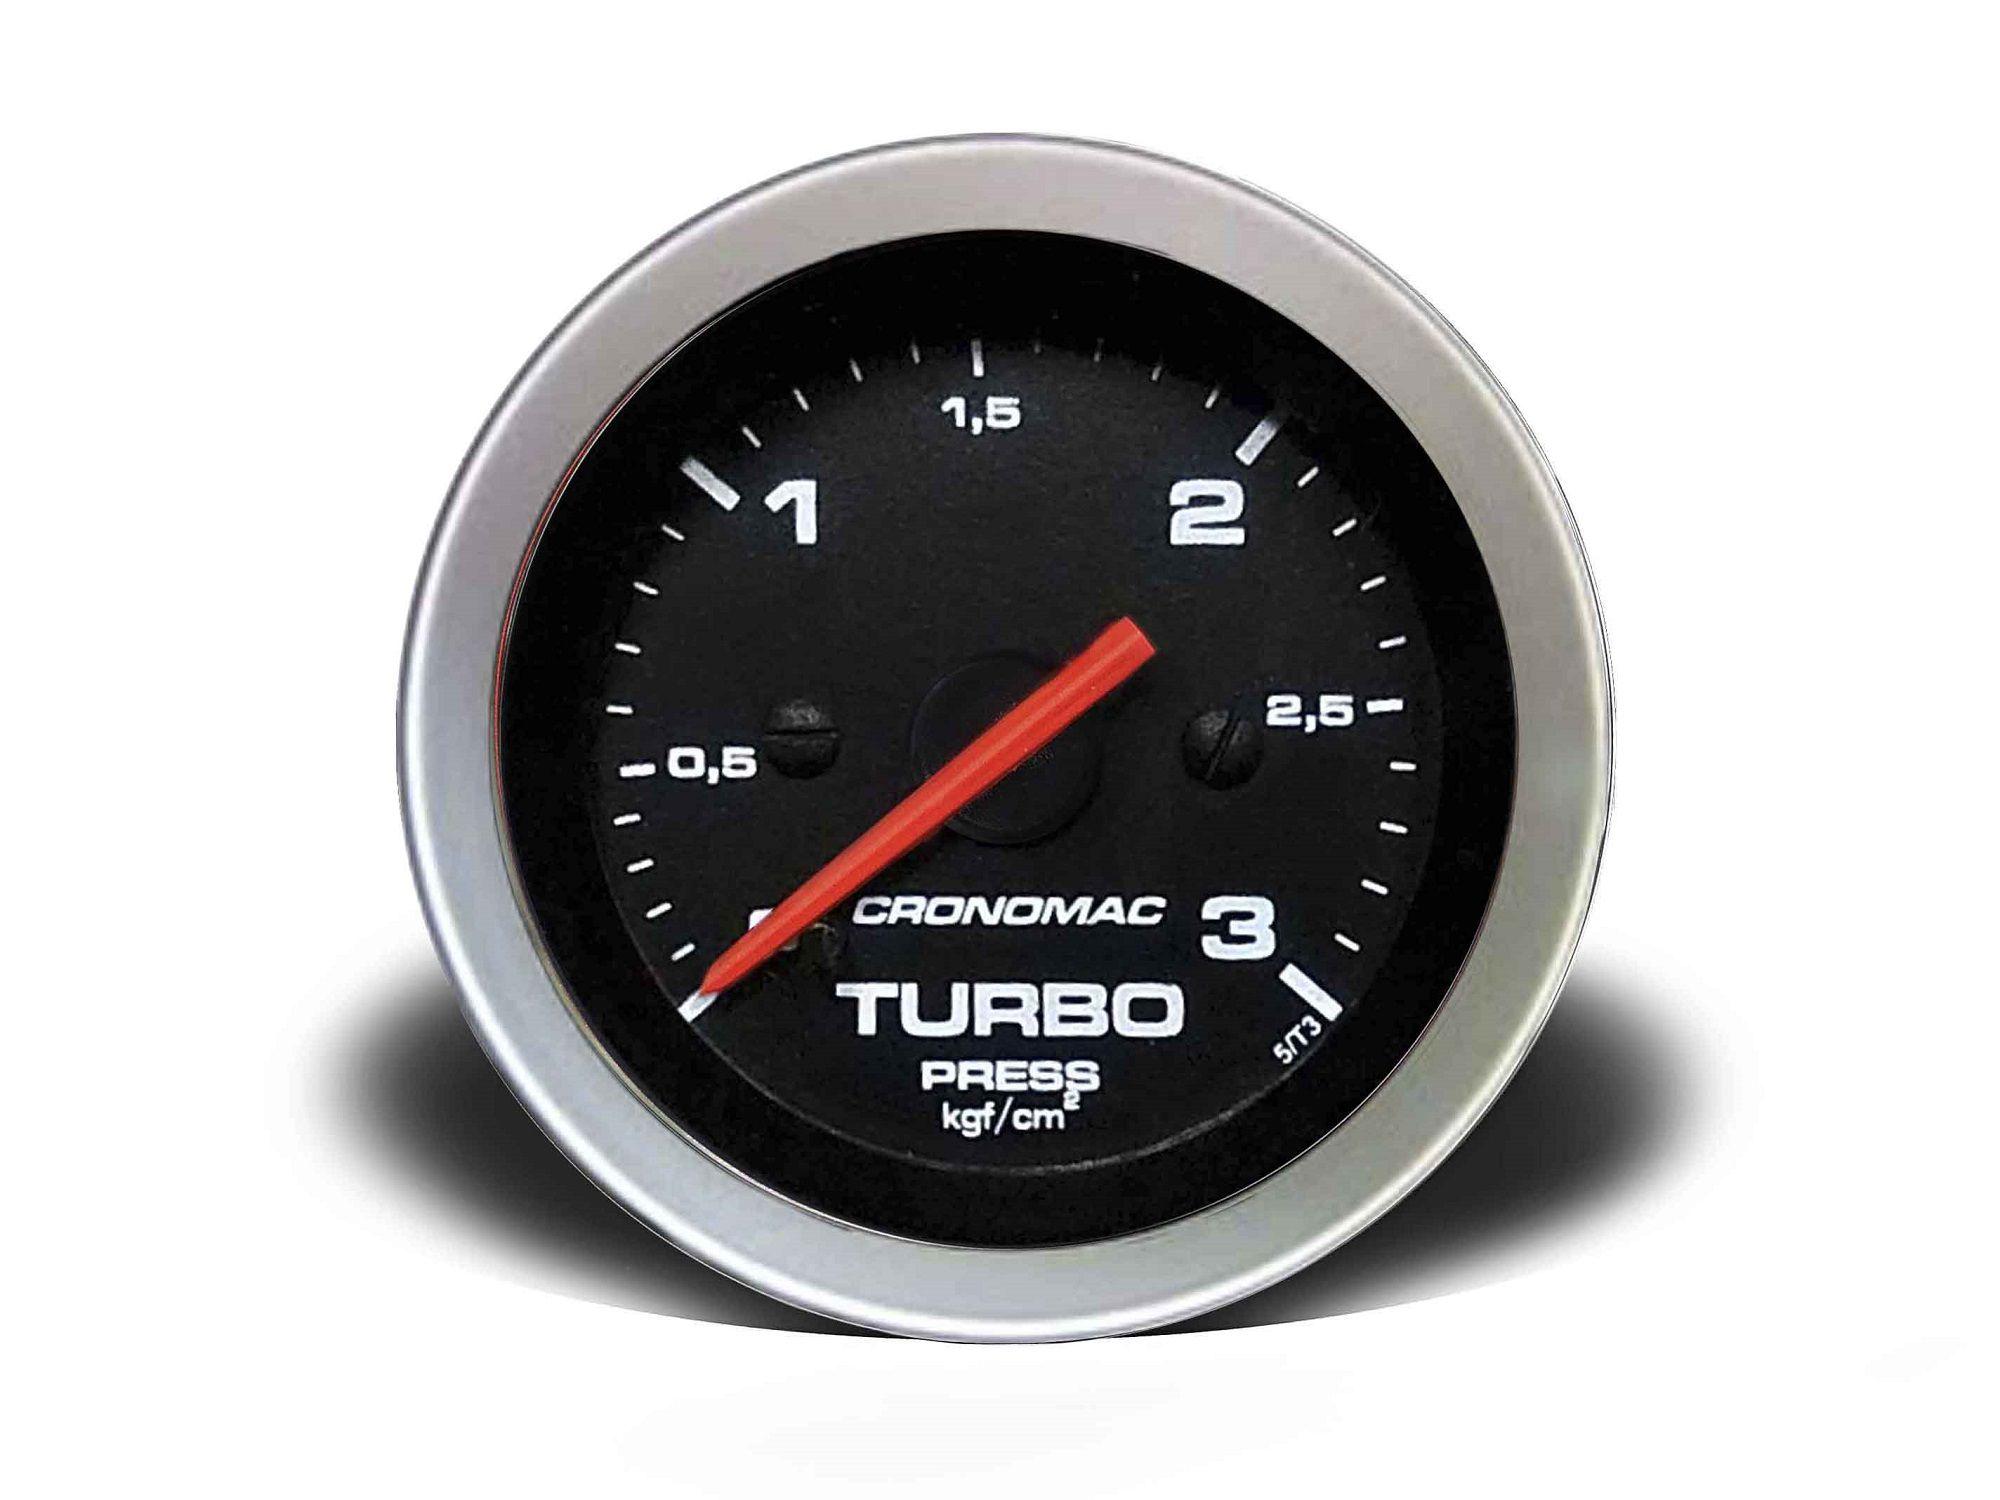 Relogio Pressao de Turbo 3kg Sport 52mm Cronomac